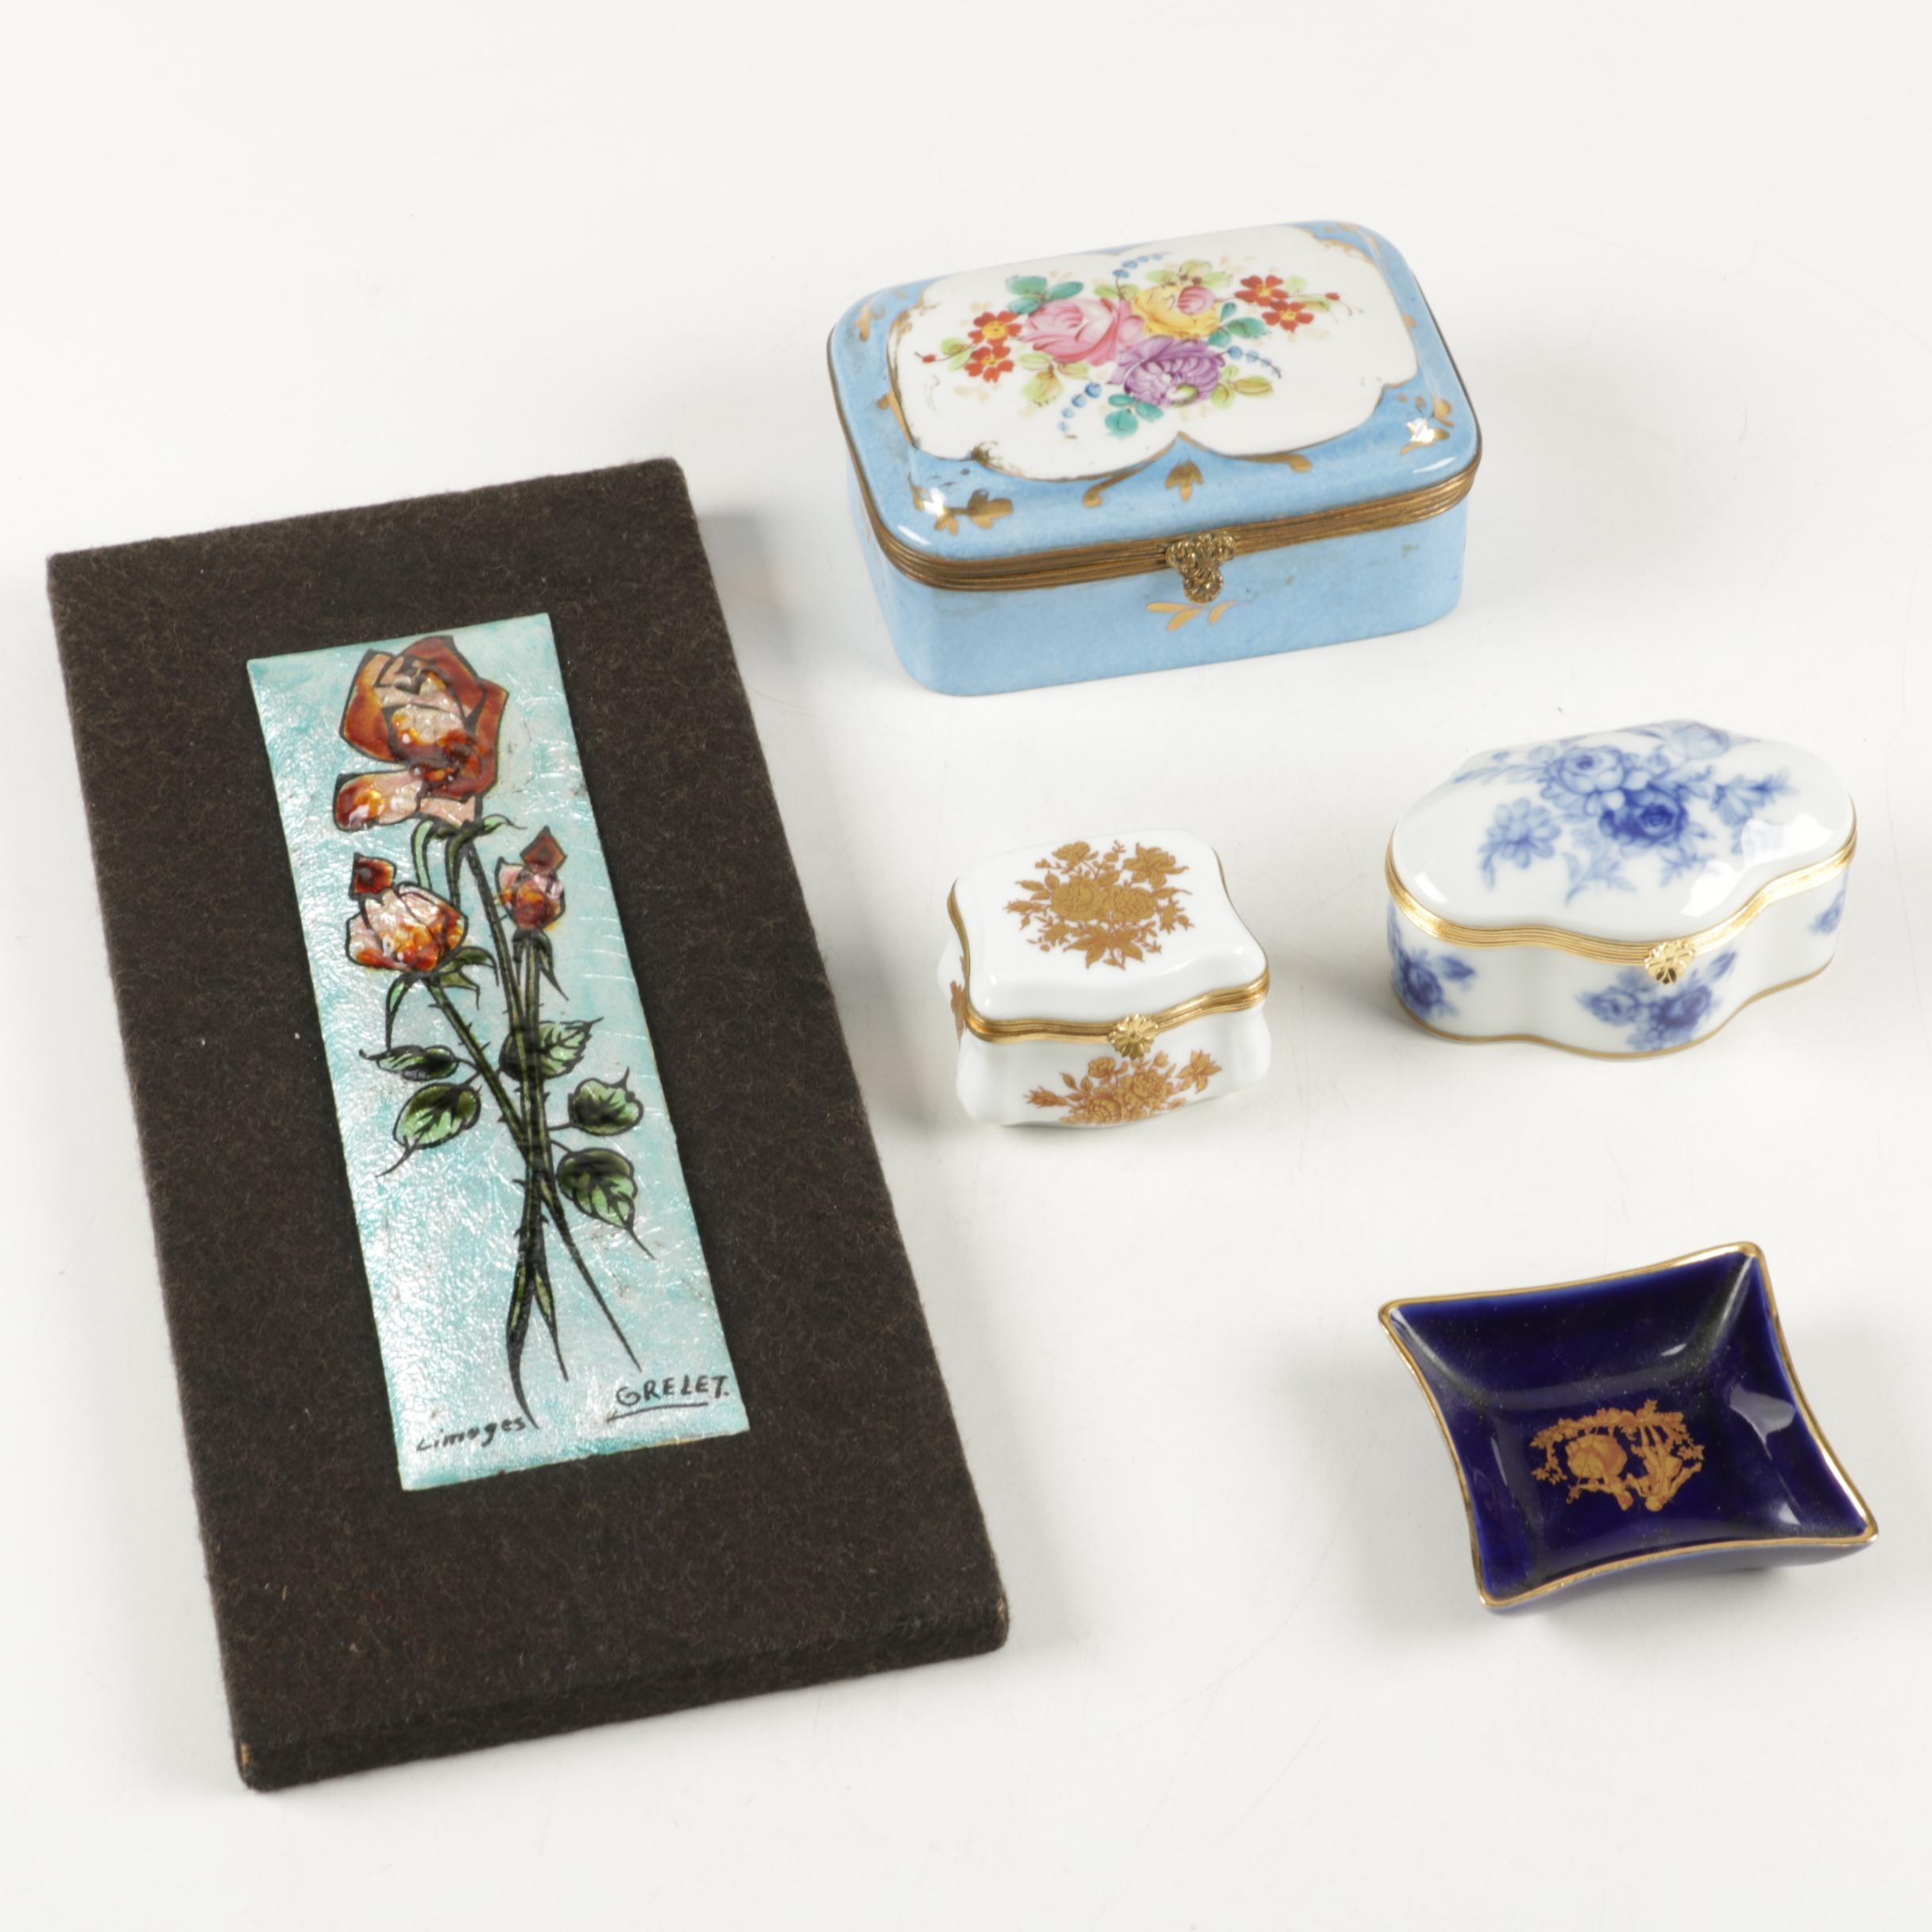 Vintage Porcelain Limoges Trinket Boxes, Tray and Other Decor